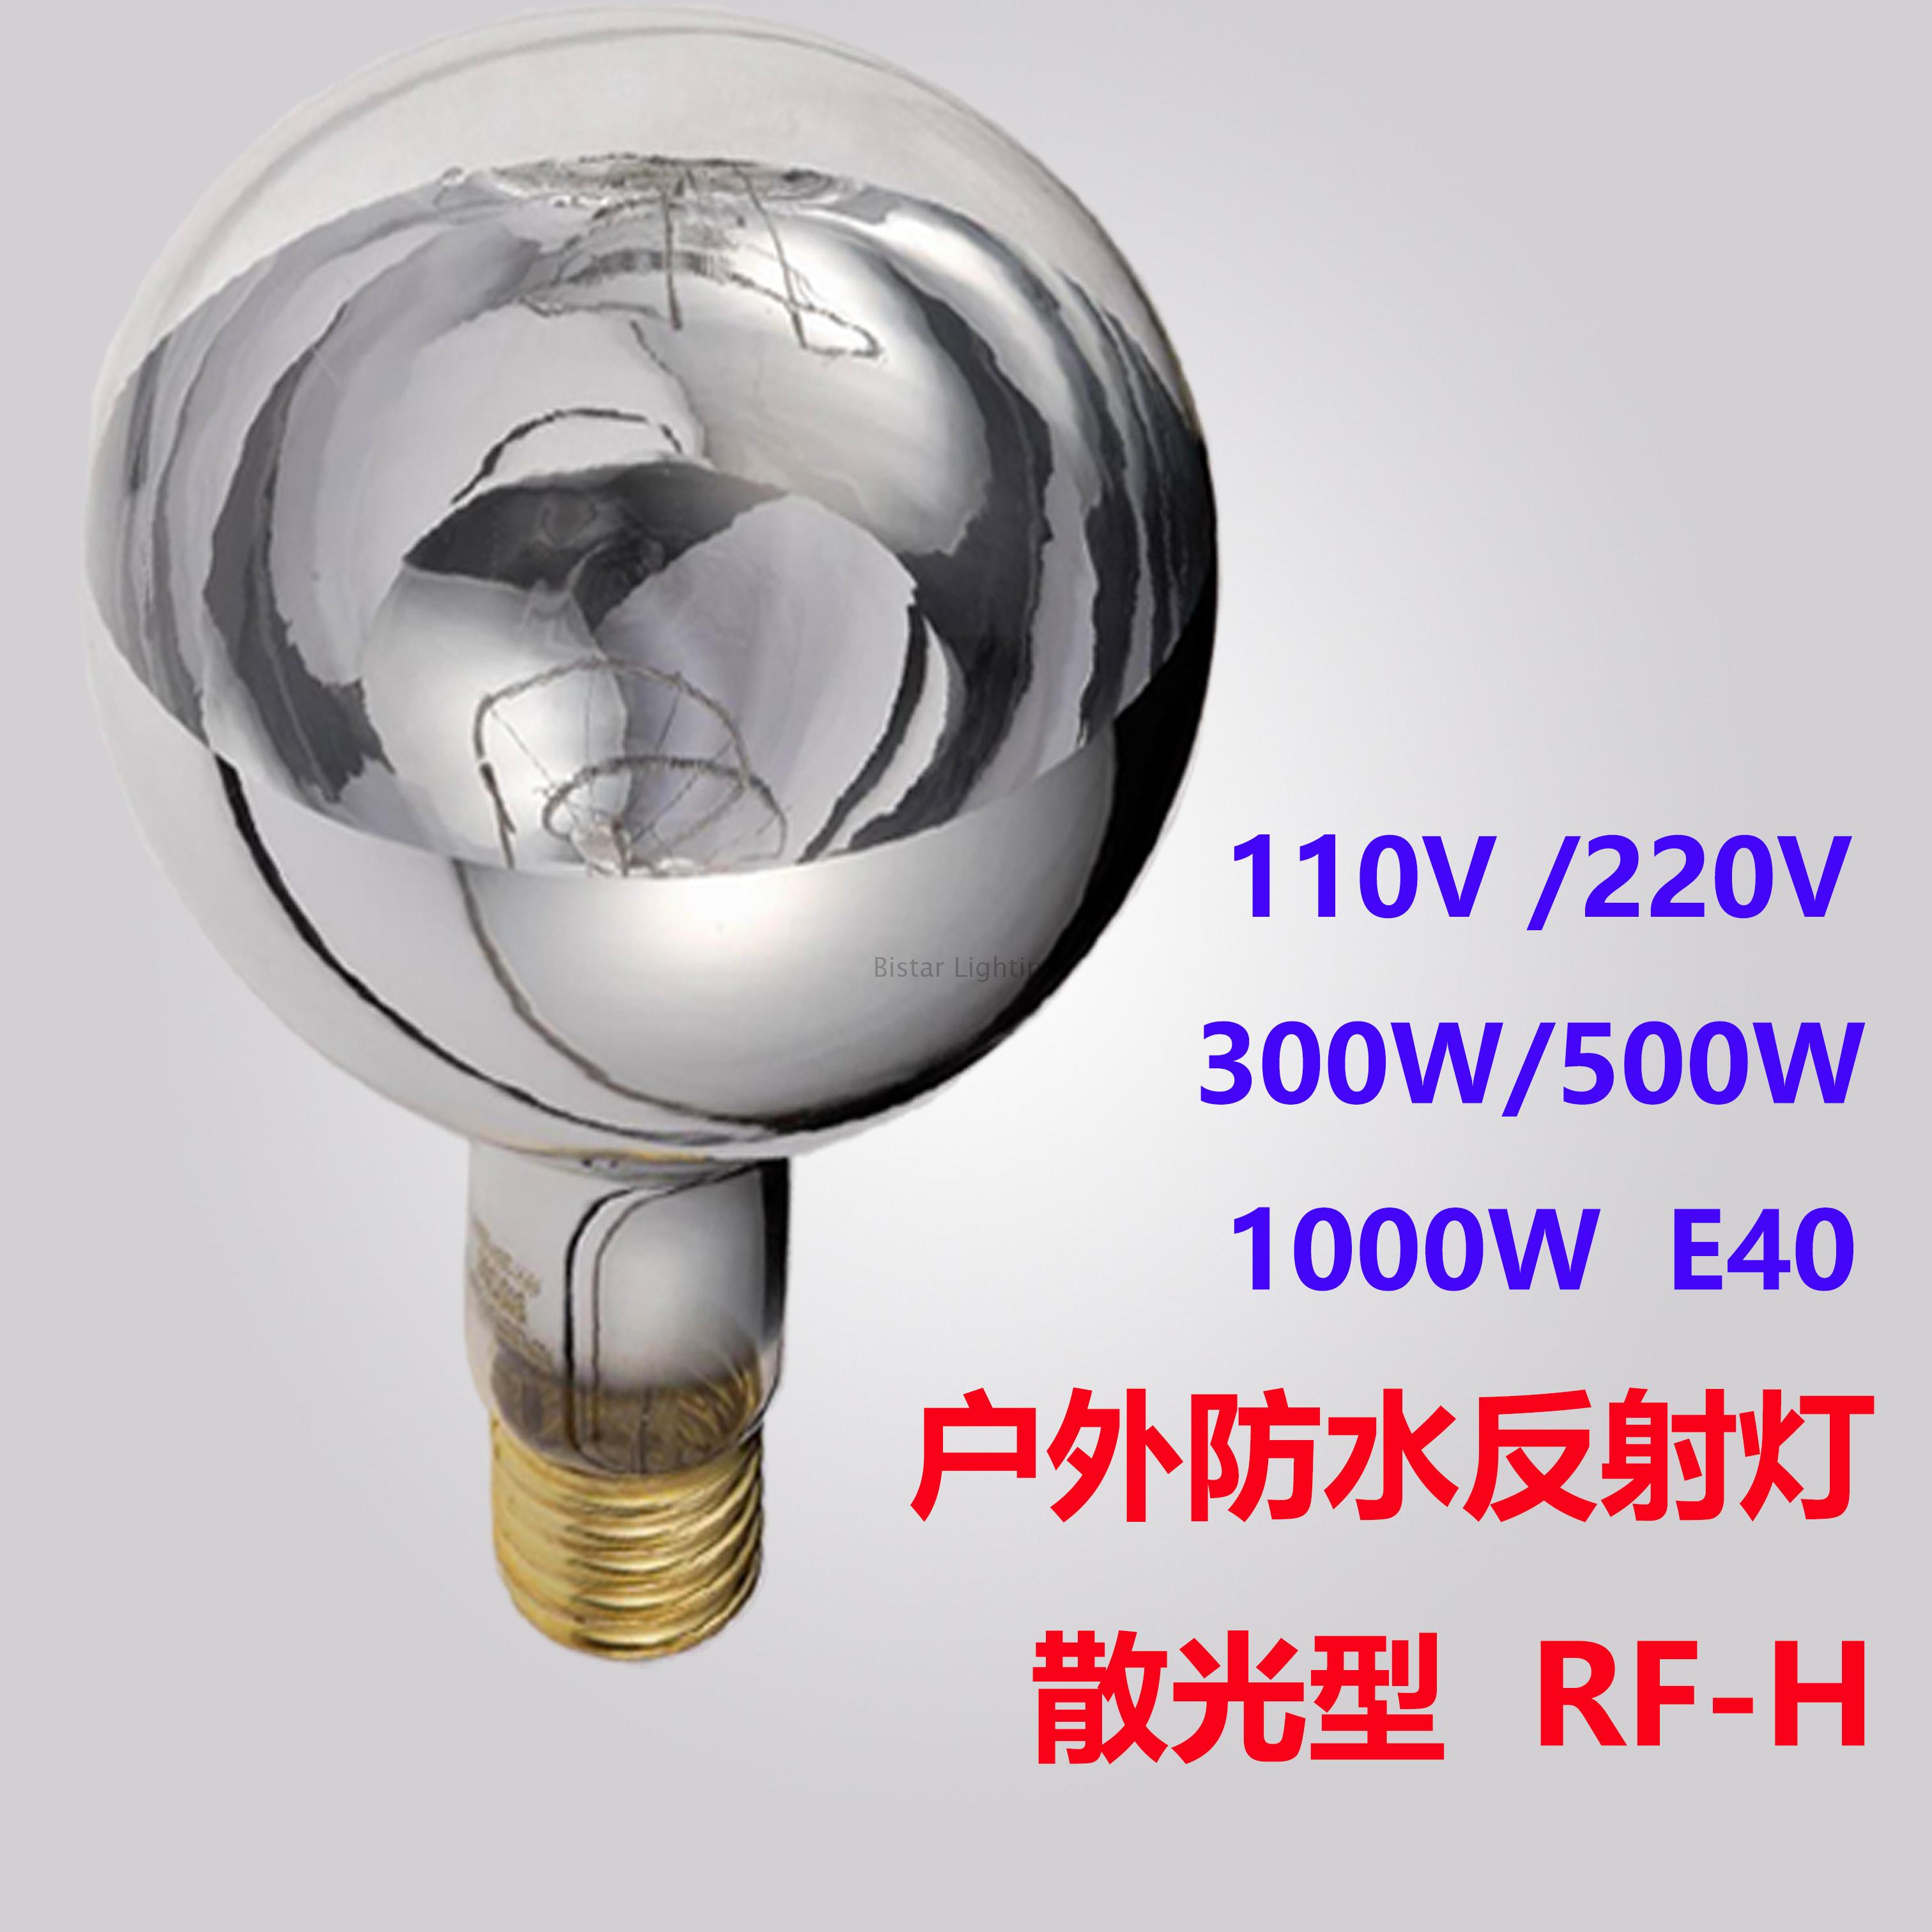 船用RFH户外防水反射灯110V220V300W500W1000W E27E40防水灯泡RSH